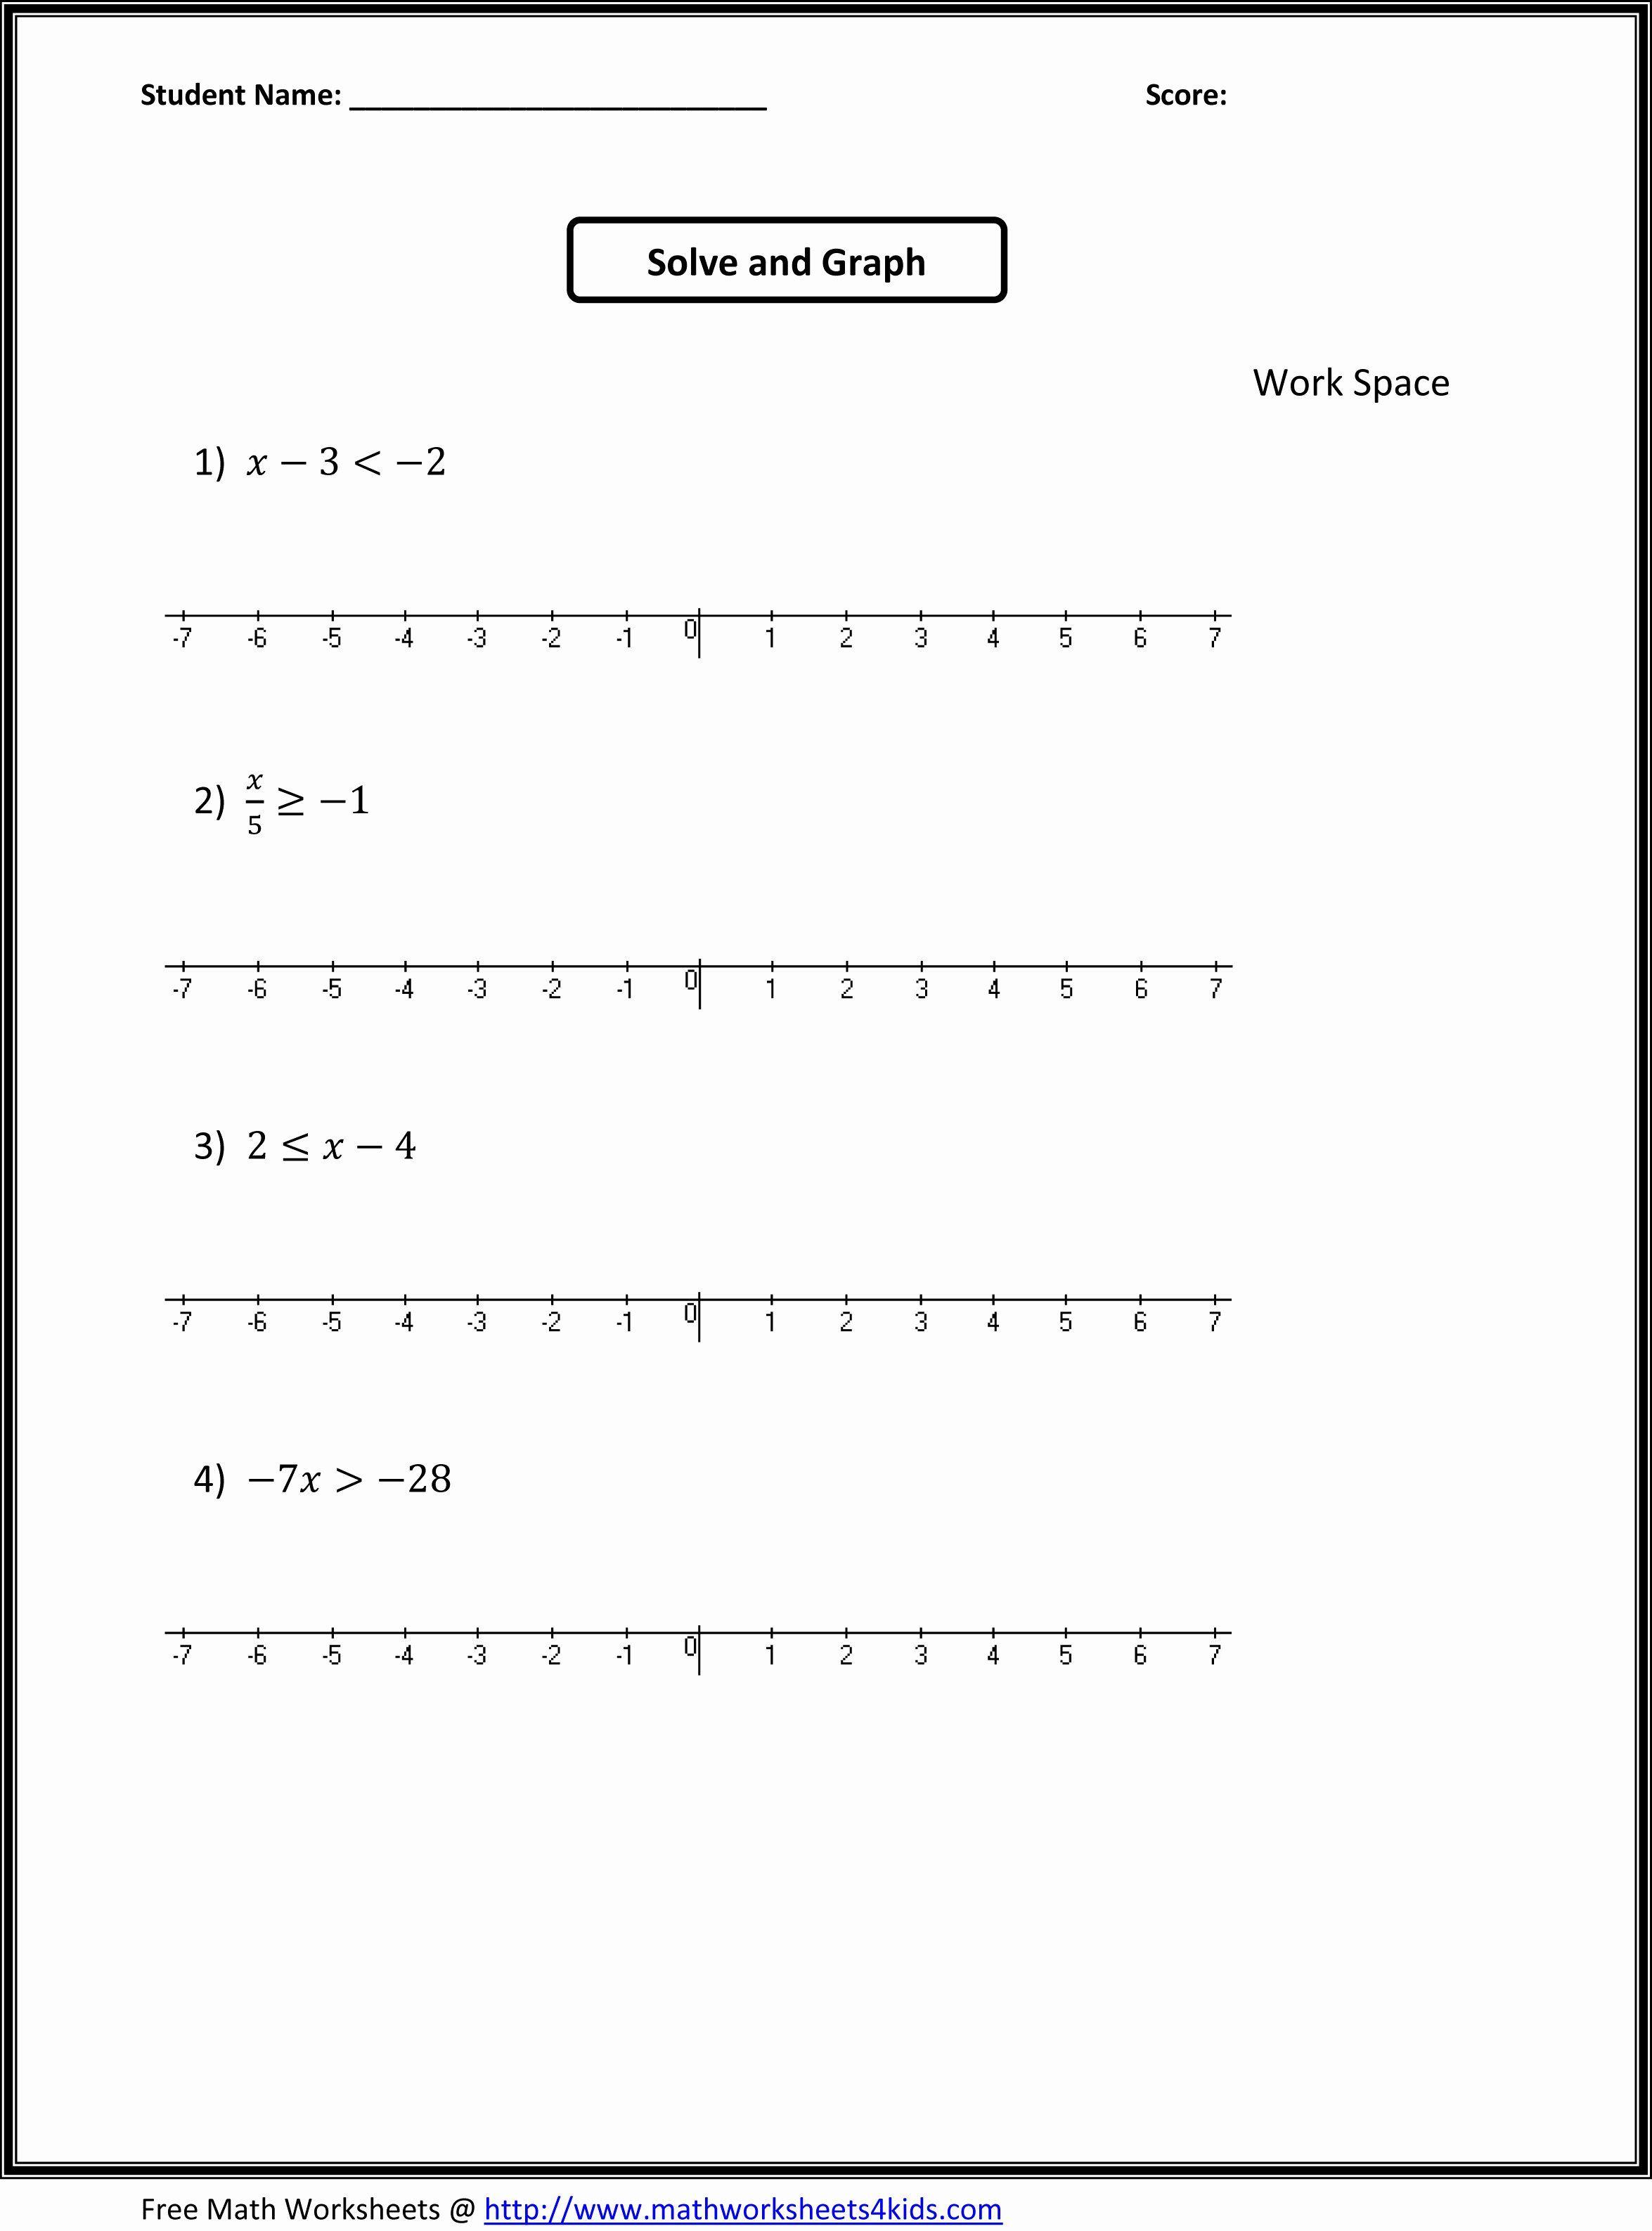 Triangle Inequality Theorem Worksheet New Download 7th Grade Math Worksheets In 2020 7th Grade Math Worksheets Algebra Worksheets 7th Grade Math